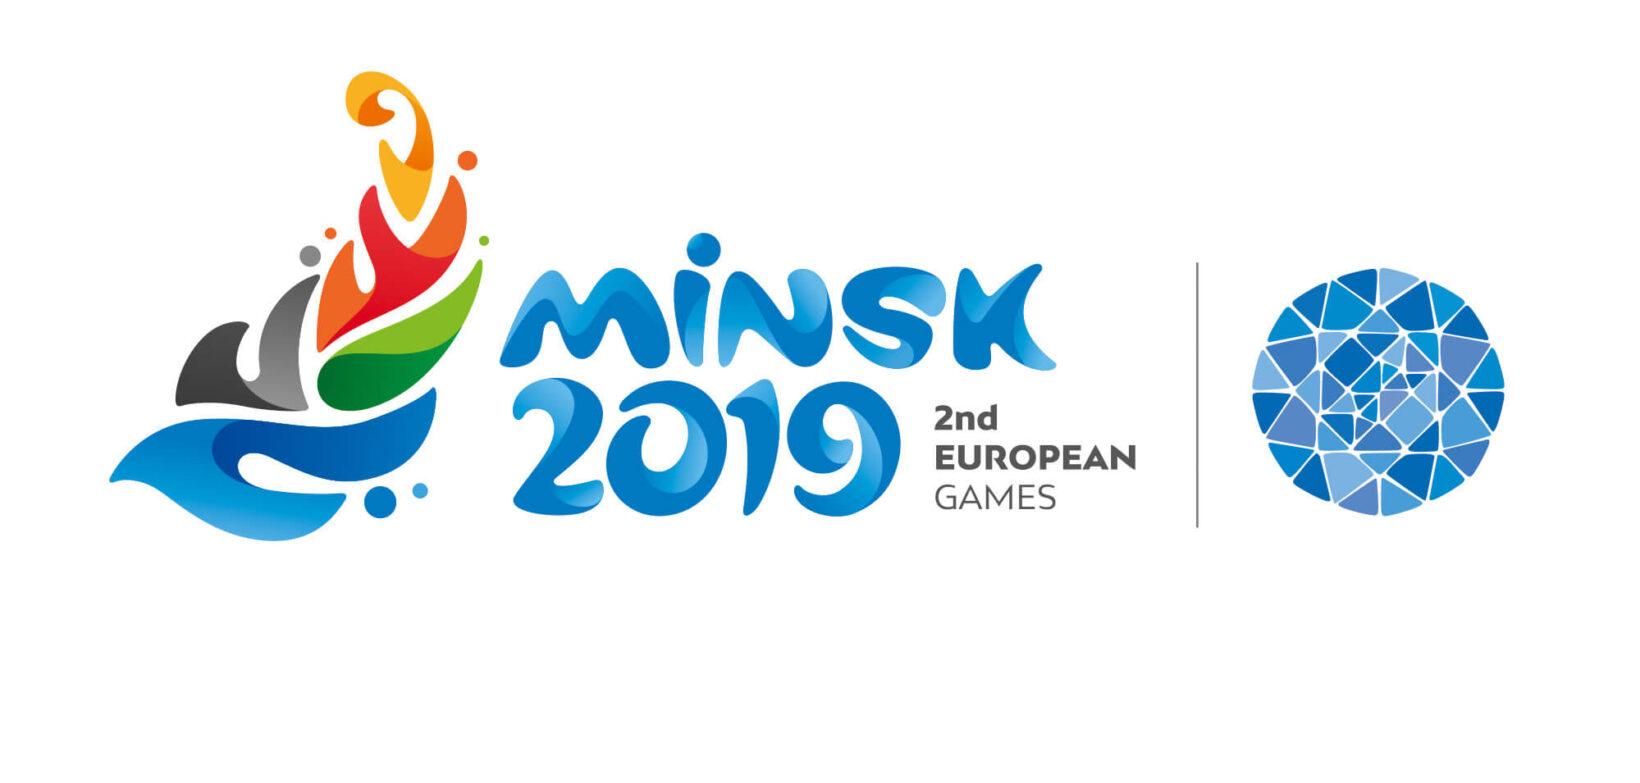 Minsk European games 2019 logo